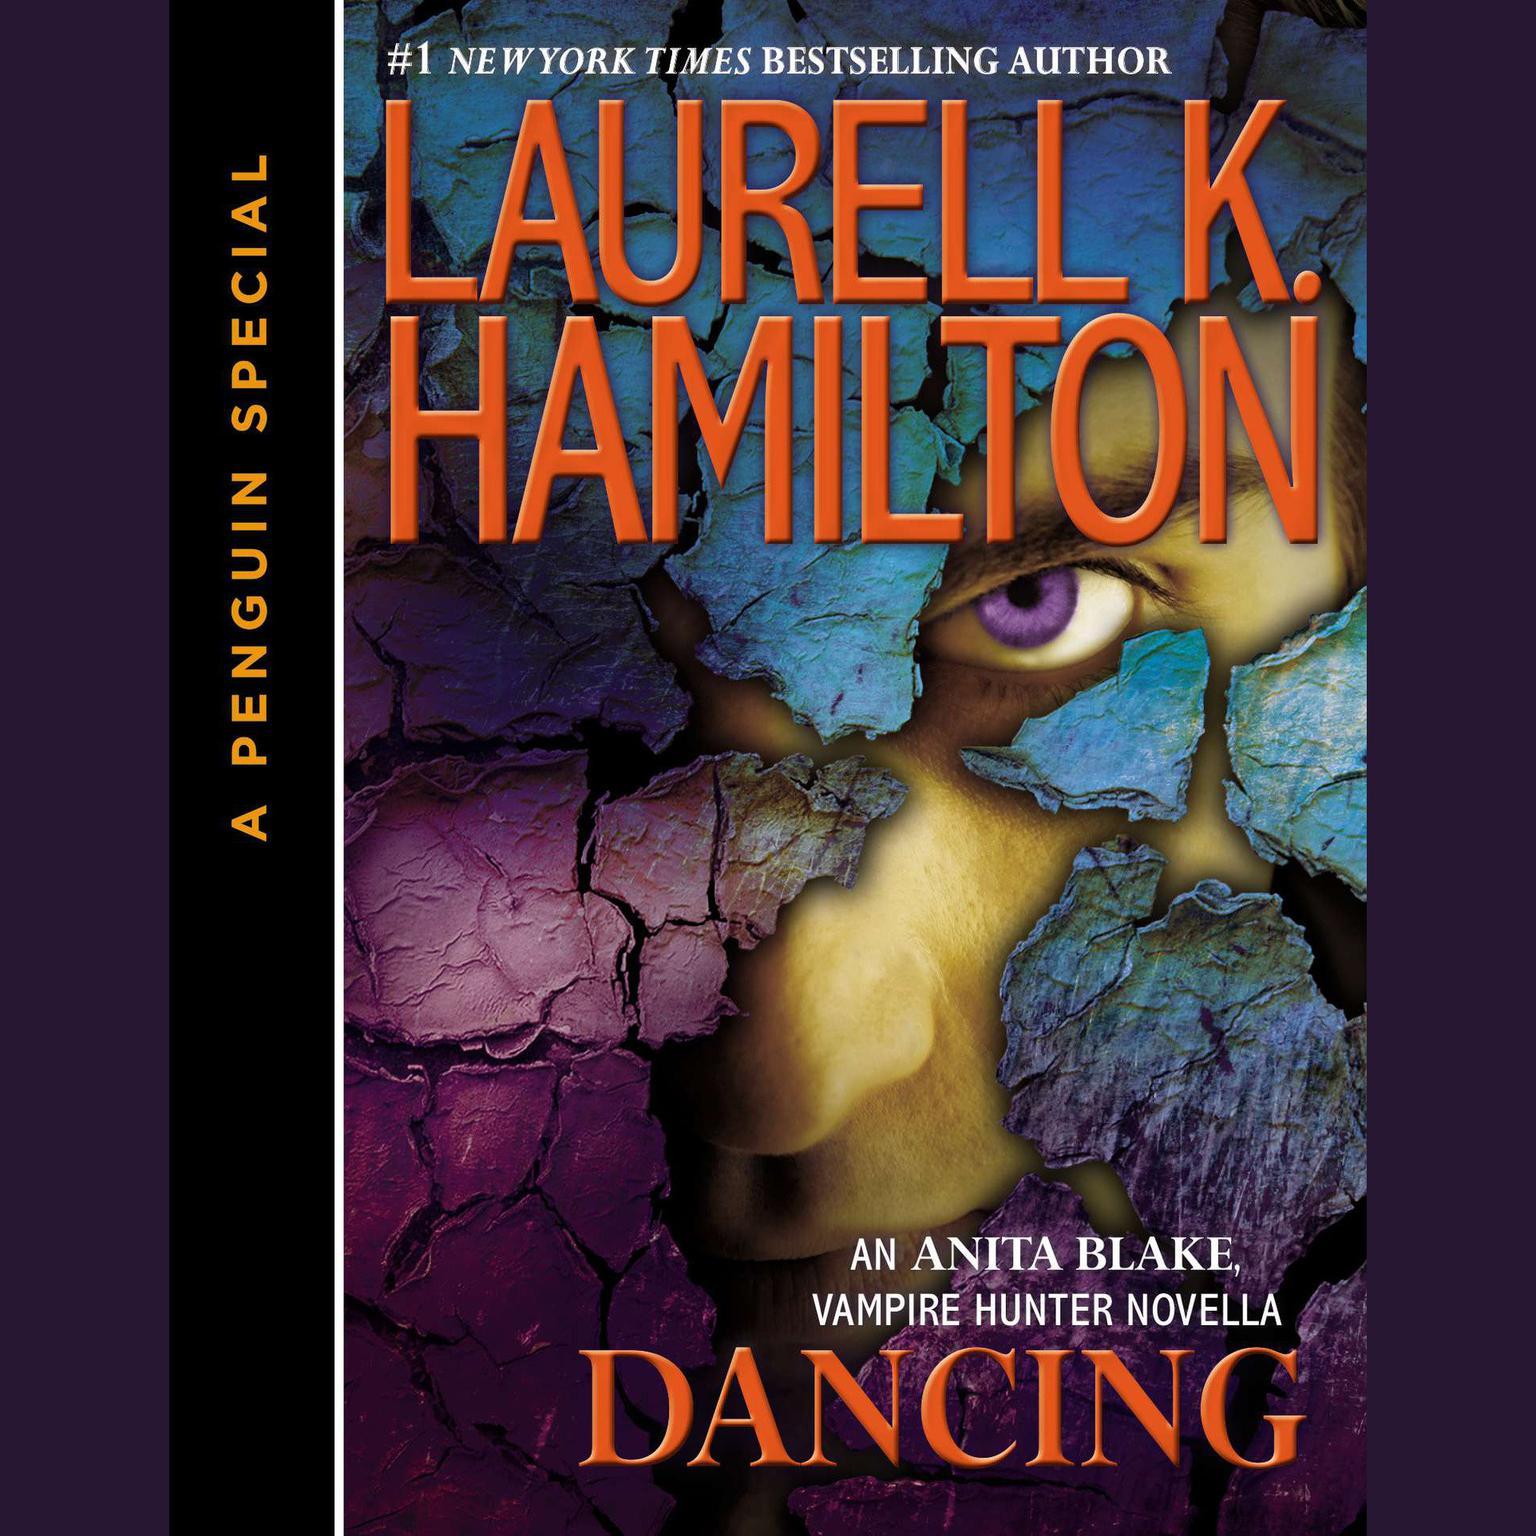 Dancing: An Anita Blake, Vampire Hunter Novella Audiobook, by Laurell K. Hamilton